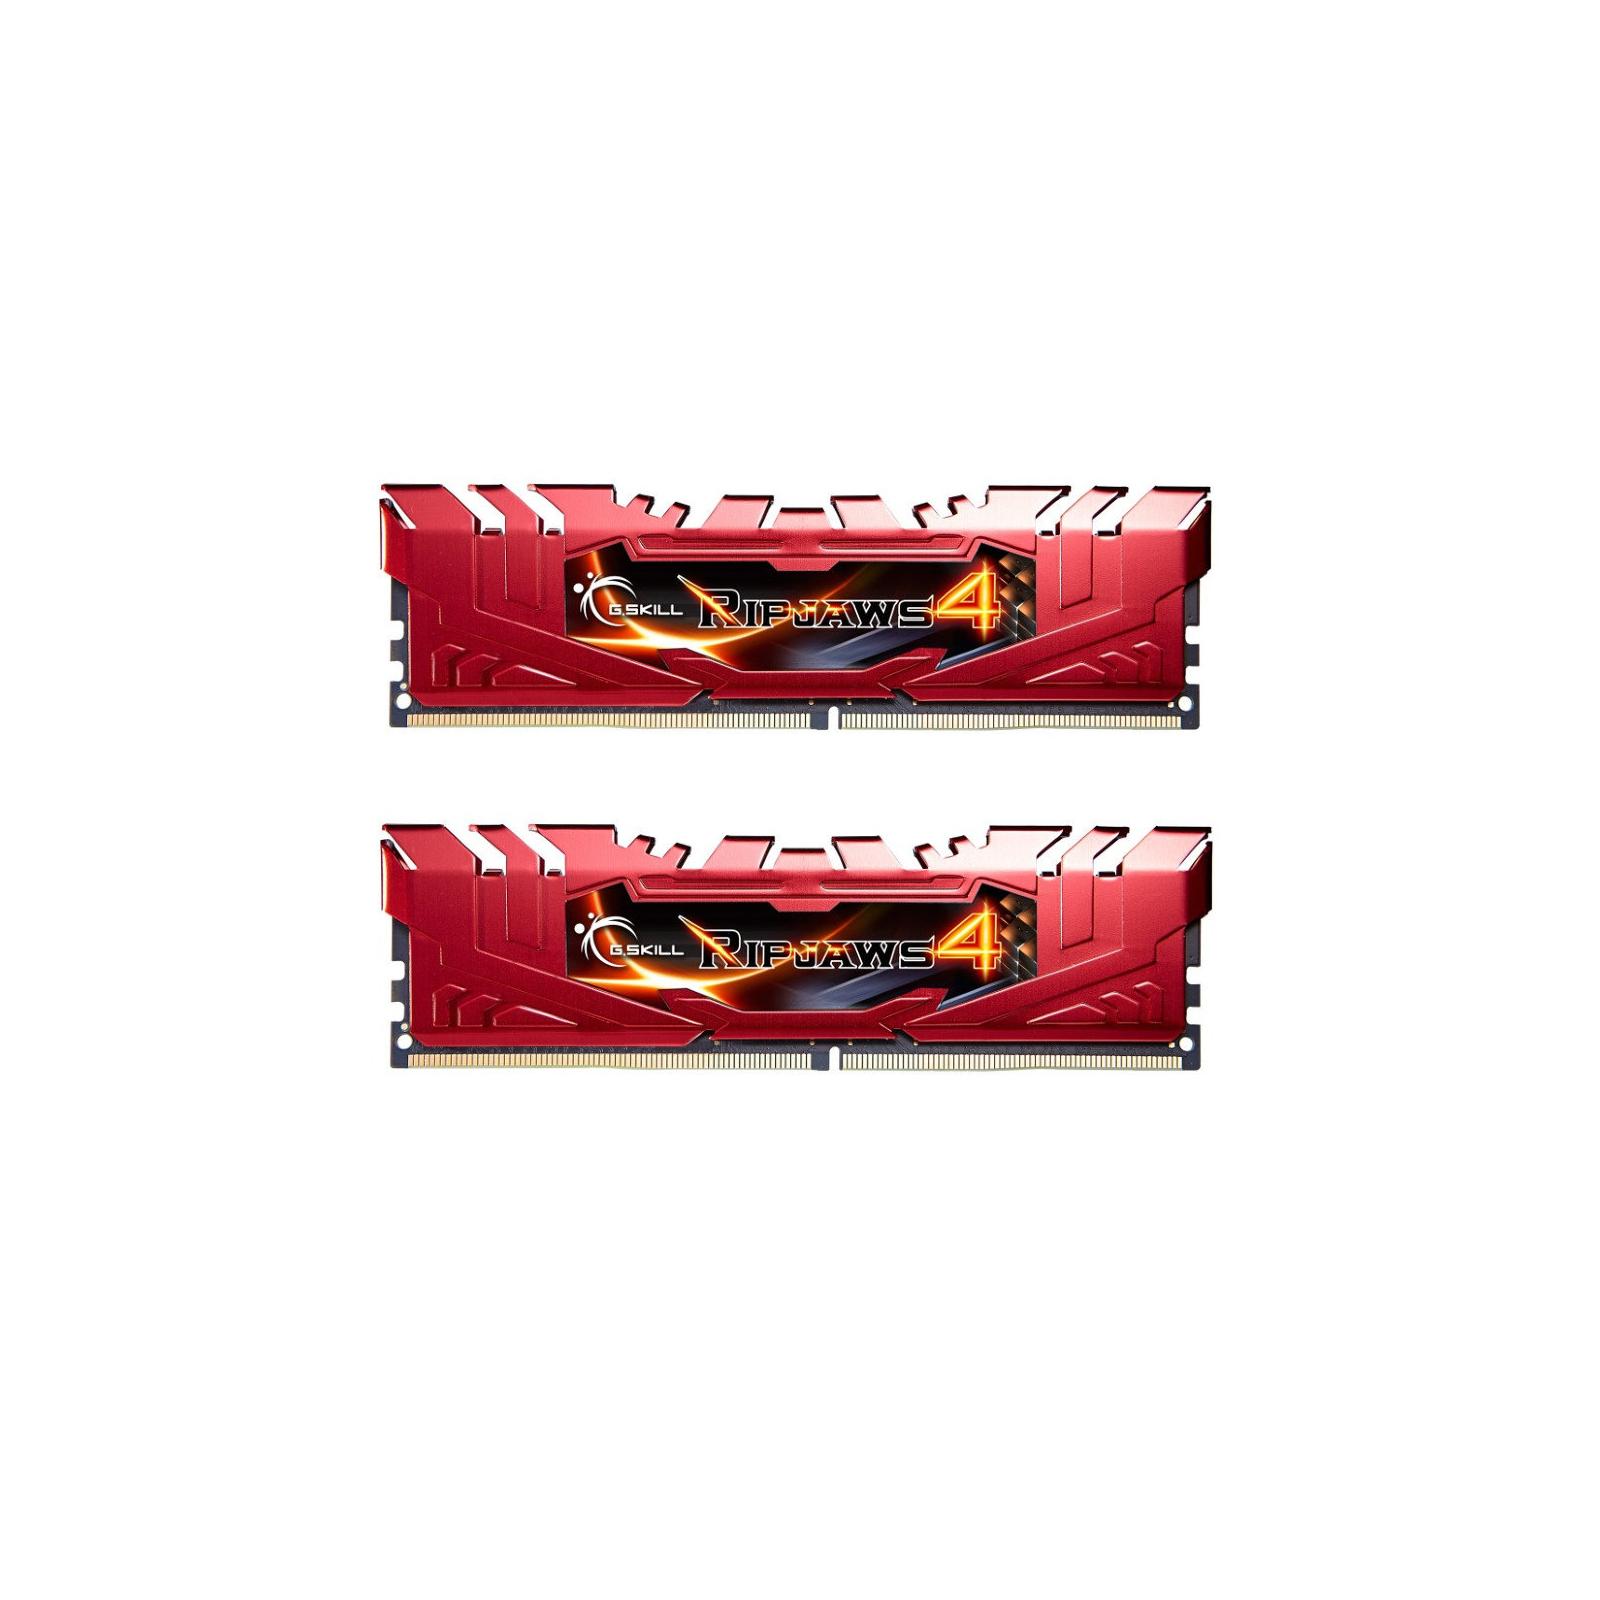 Модуль памяти для компьютера DDR4 16GB (2x8GB) 2400 MHz Ripjaws G.Skill (F4-2400C15D-16GRR)